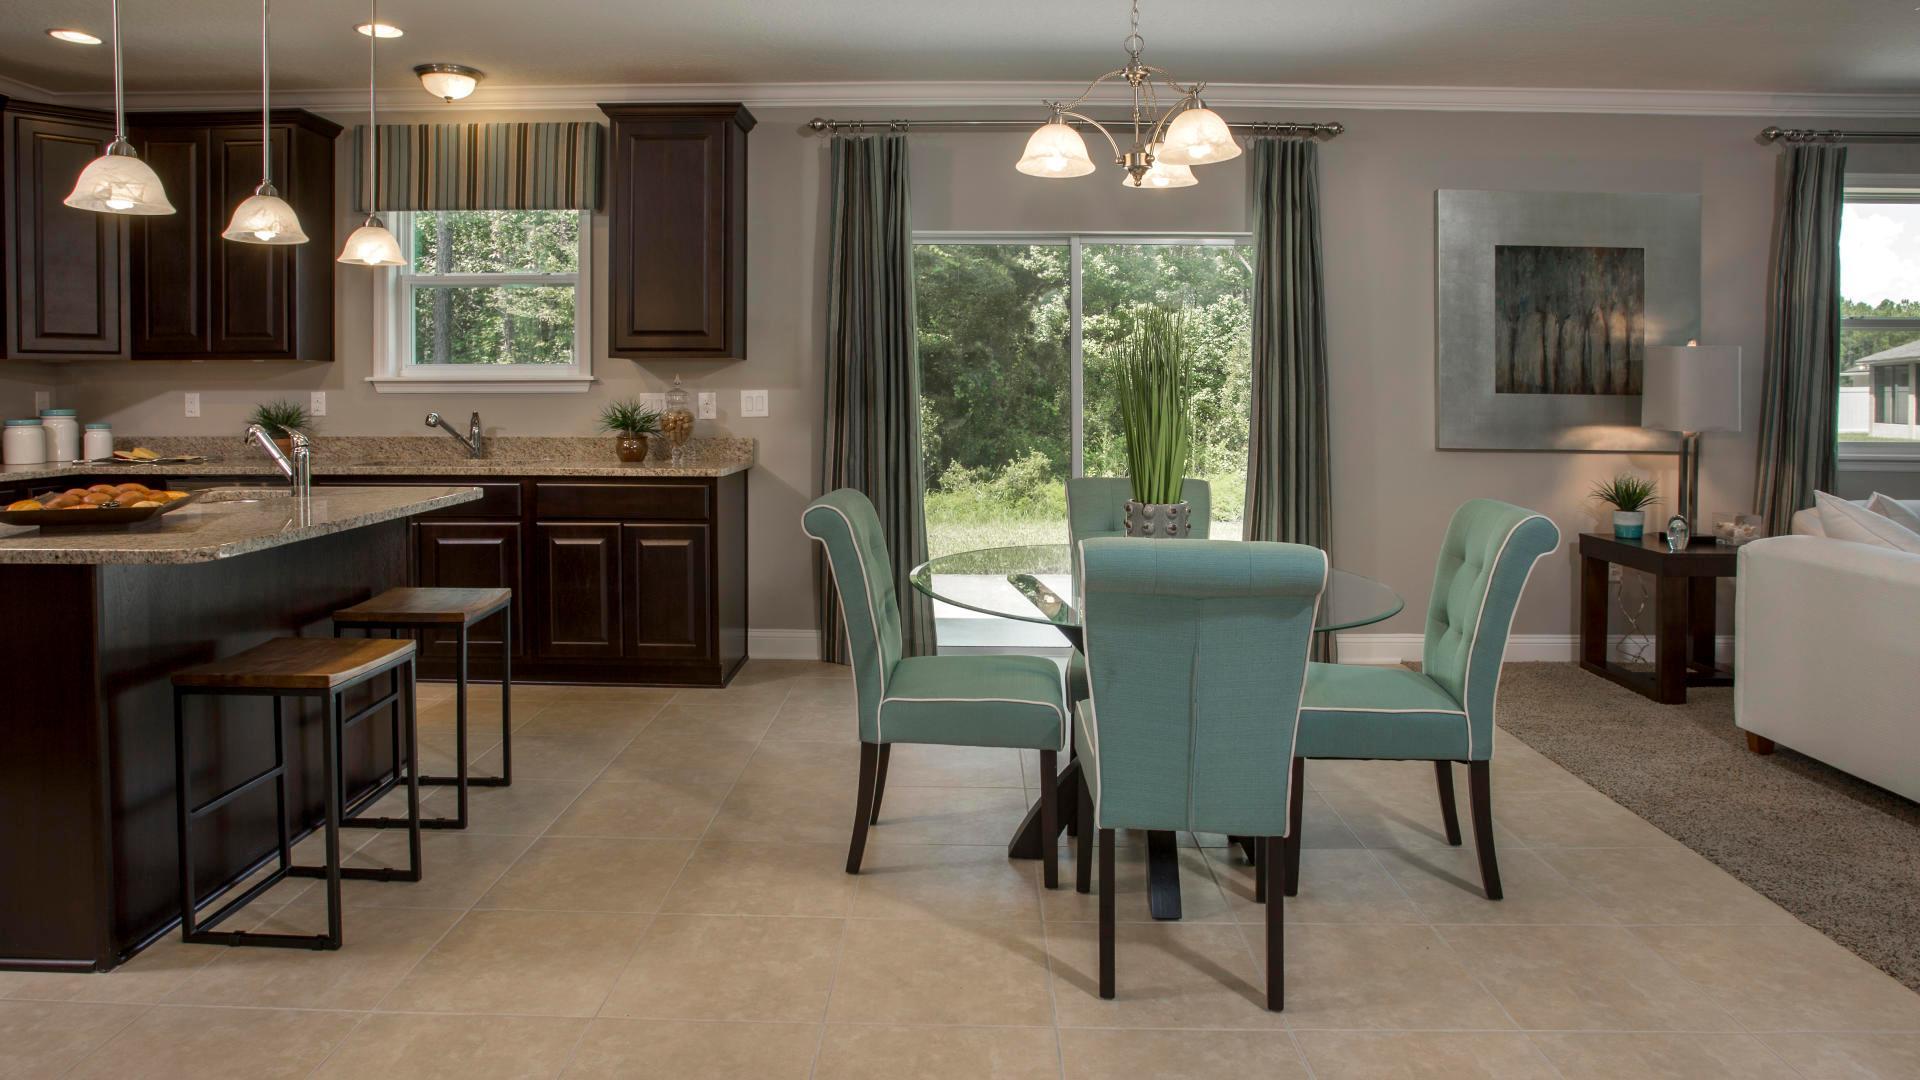 Kitchen featured in the Baybury By Maronda Homes in Daytona Beach, FL